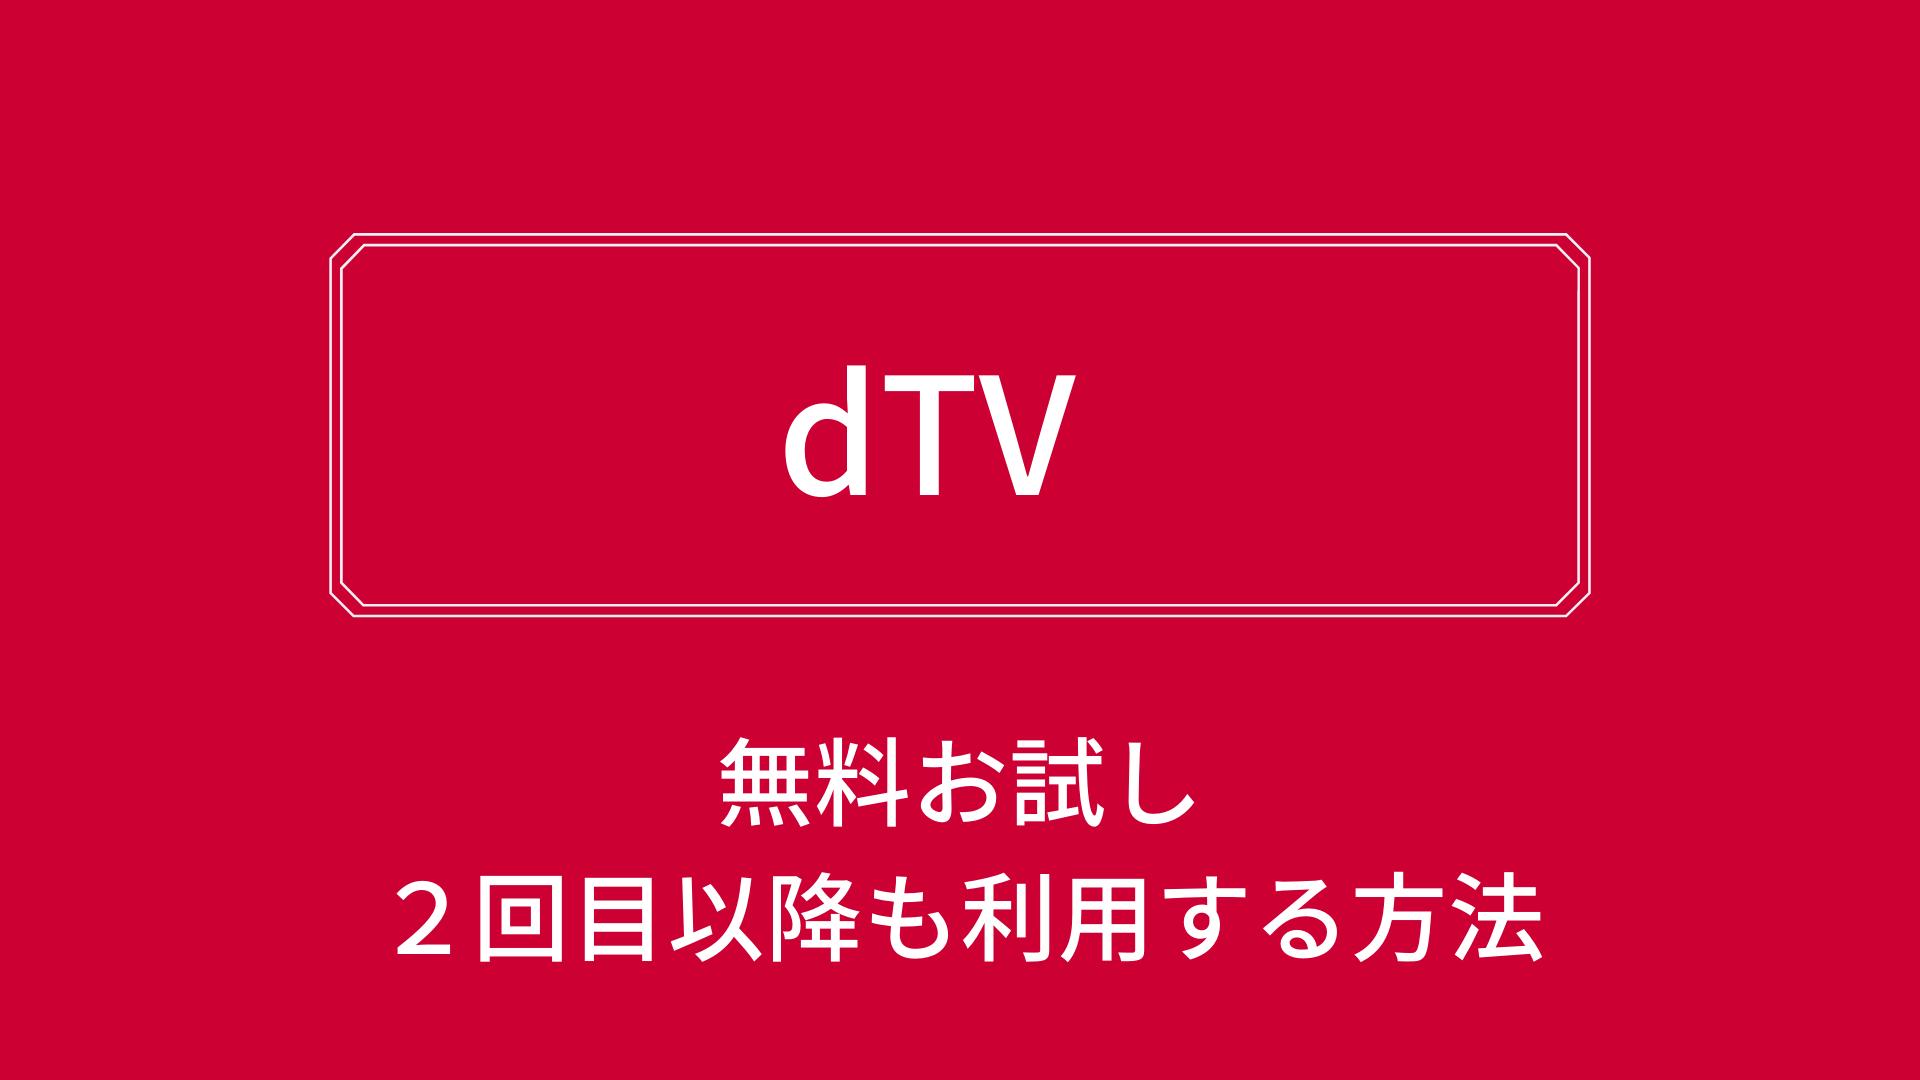 dTV無料お試しは2回目でも利用できる?再契約方法を解説!